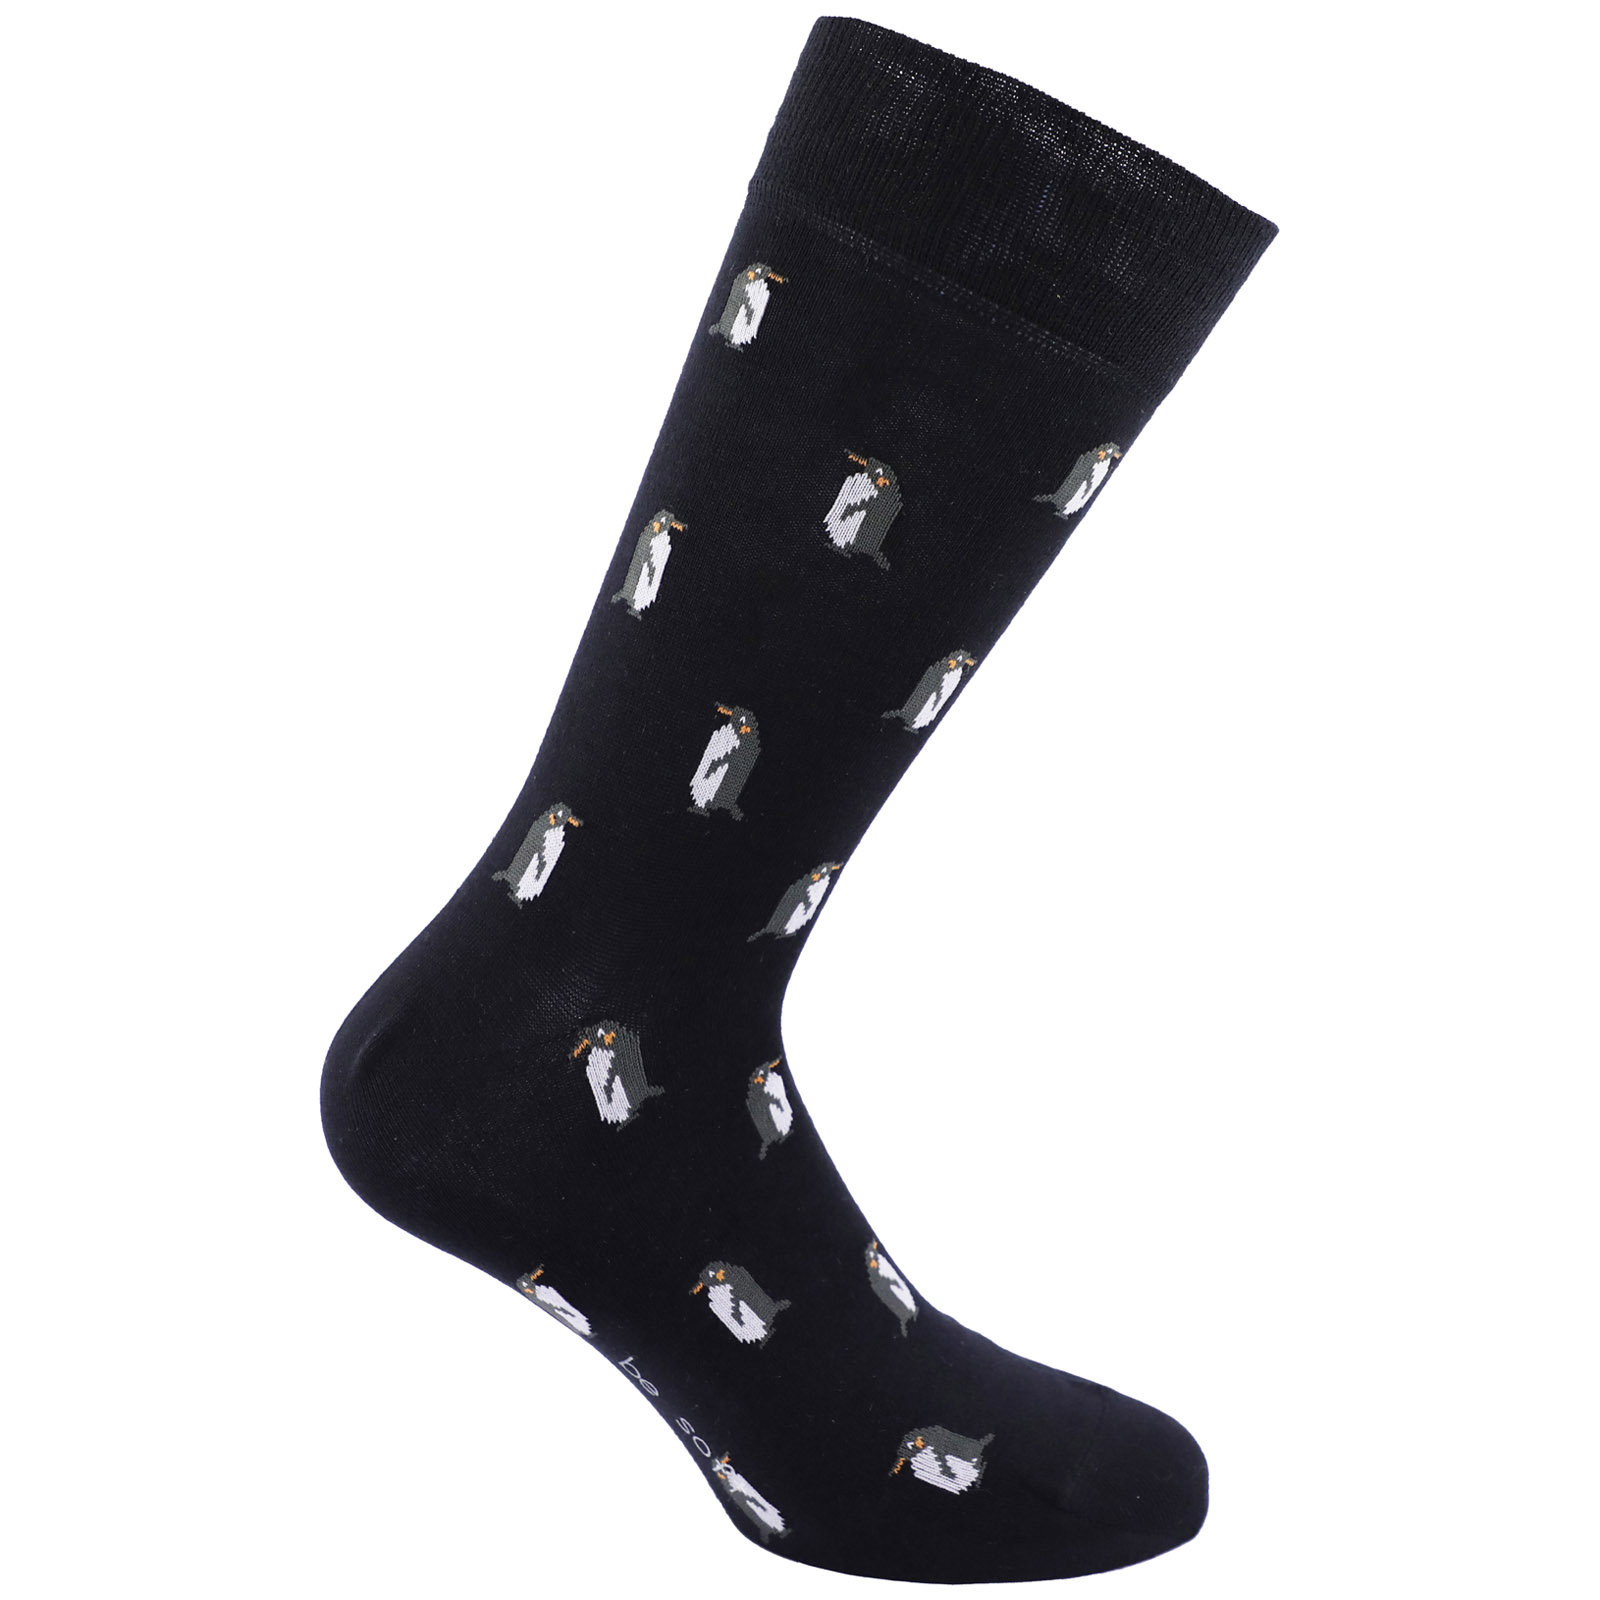 Low socks man penguins